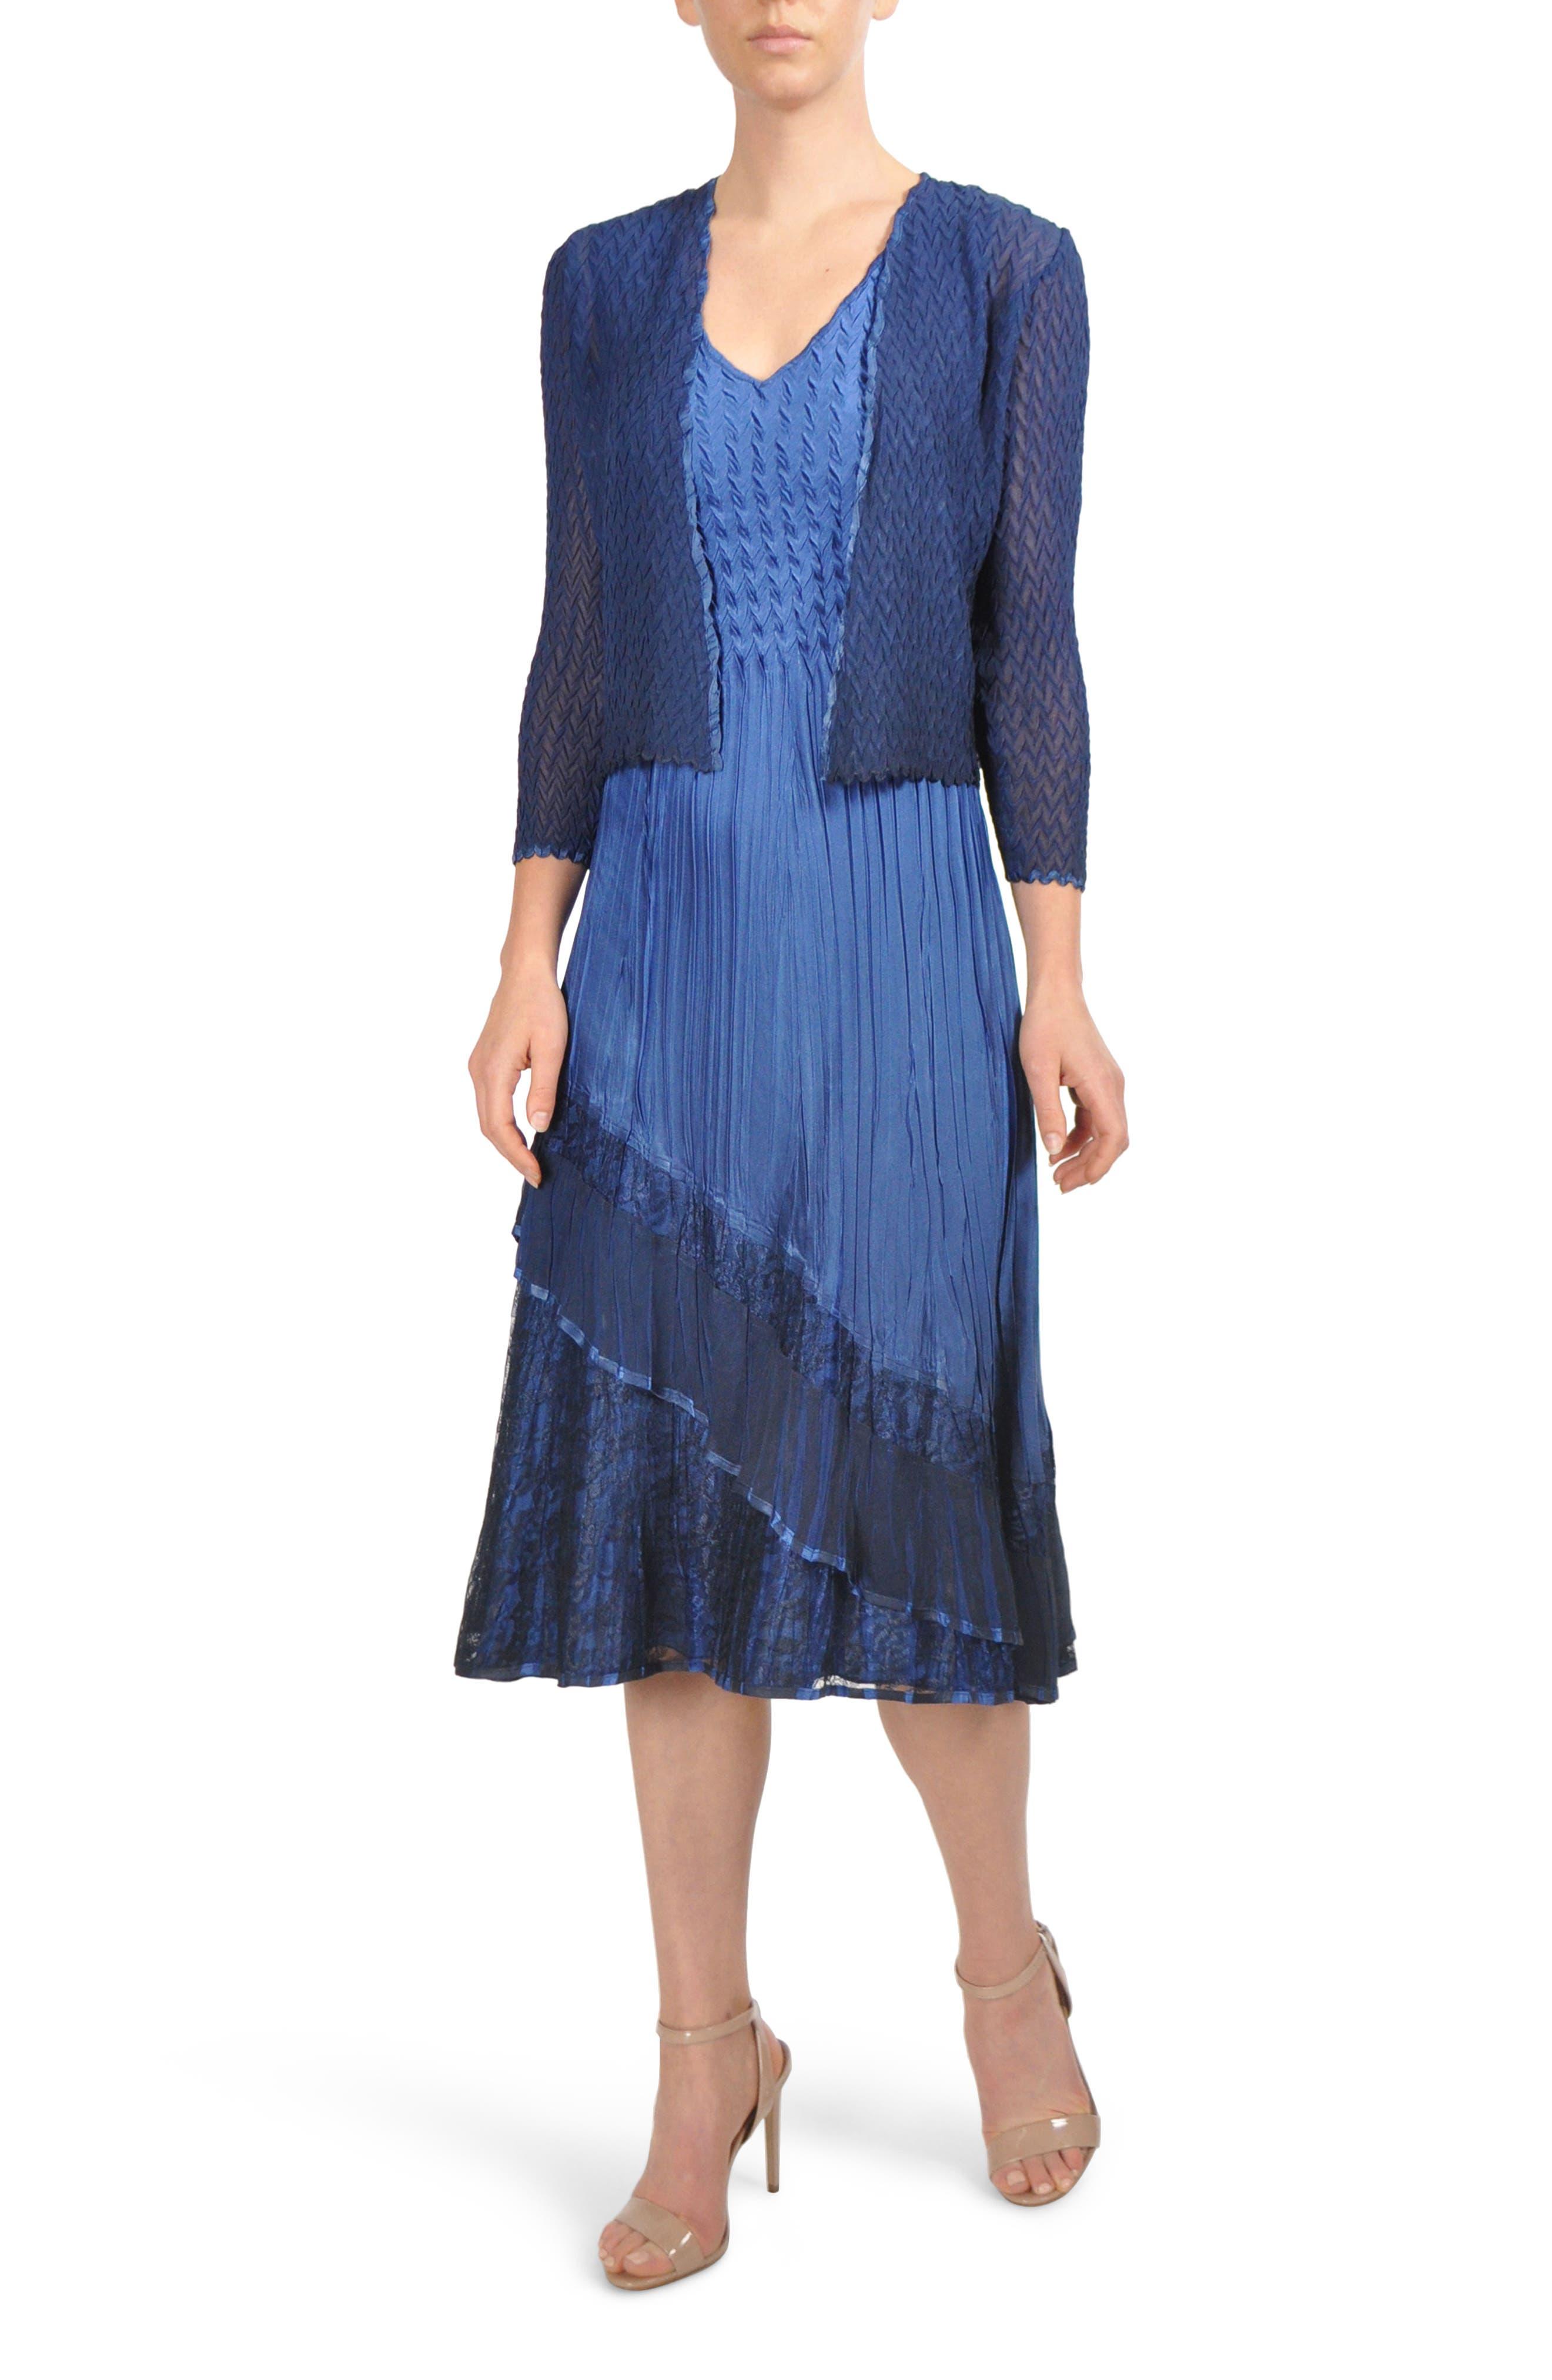 Komorov Midi Dress with Jacket,                         Main,                         color, 484